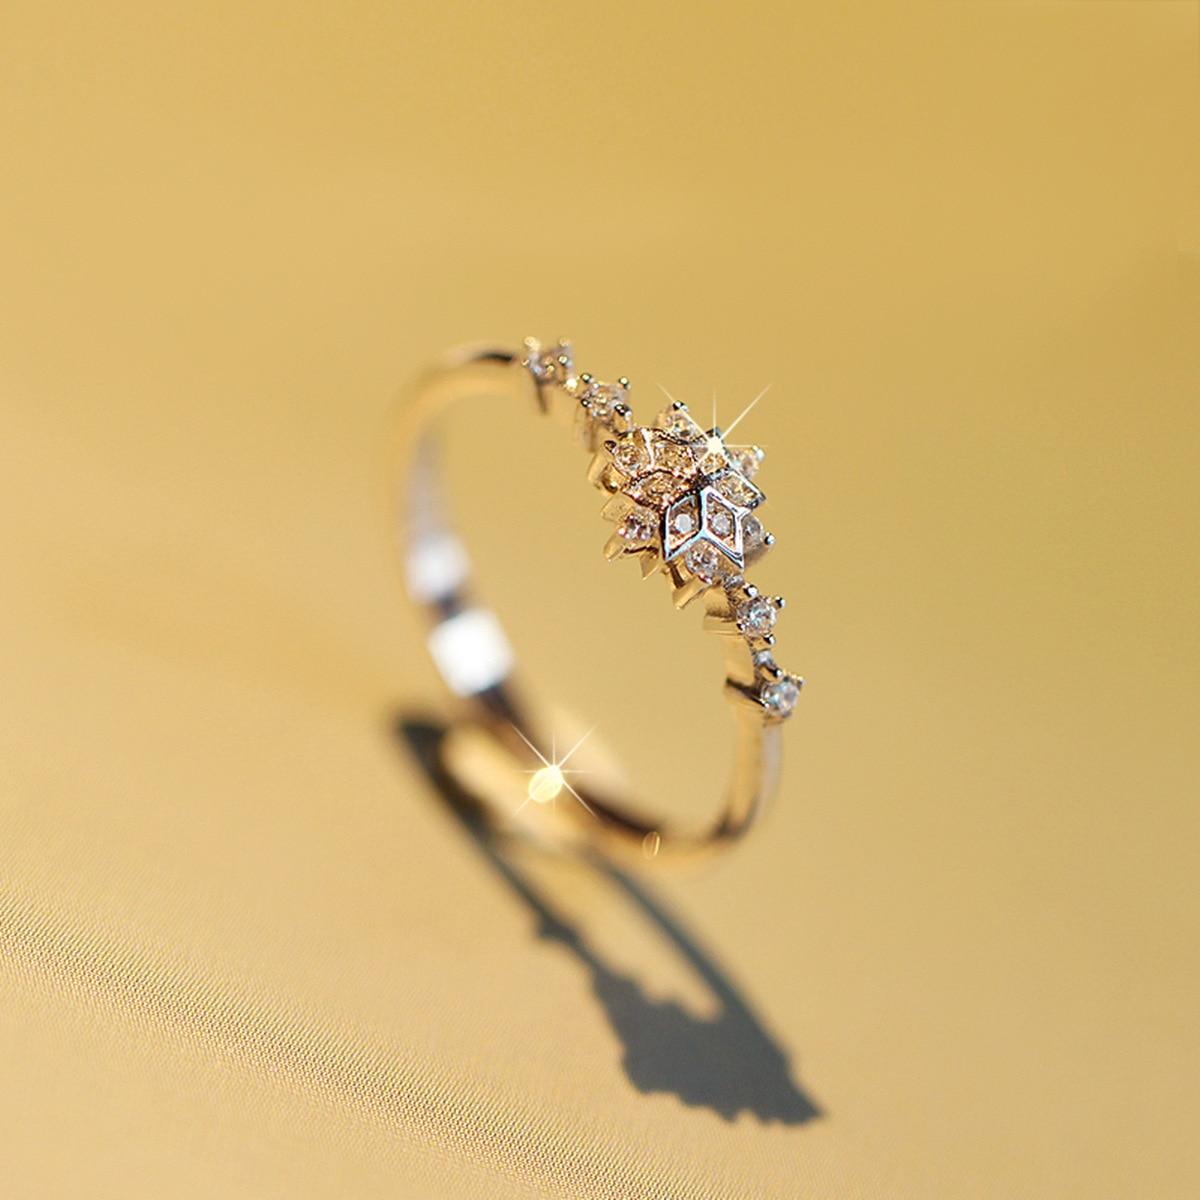 10k Yellow Gold Zircon Diamond Ring For Women Fine Jewelry Bizuteria Anillos De Gemstone Peridot Bague Etoile 10K Diamond Rings